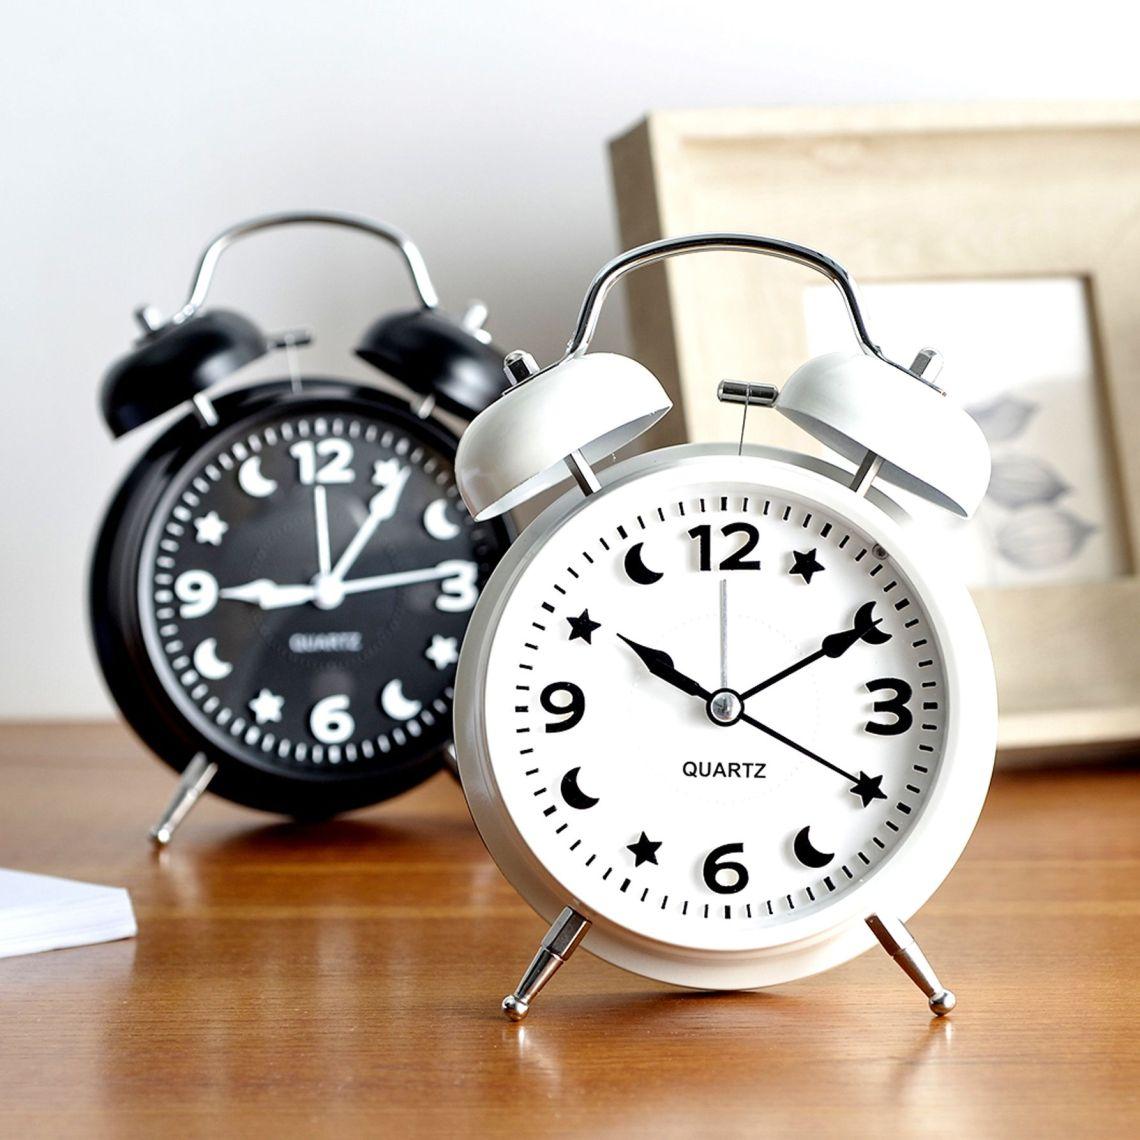 Wonderful Alarm Bedside - bedside-fashion-simple-lazy-loud-voice-alarm  Collection_73814.jpg